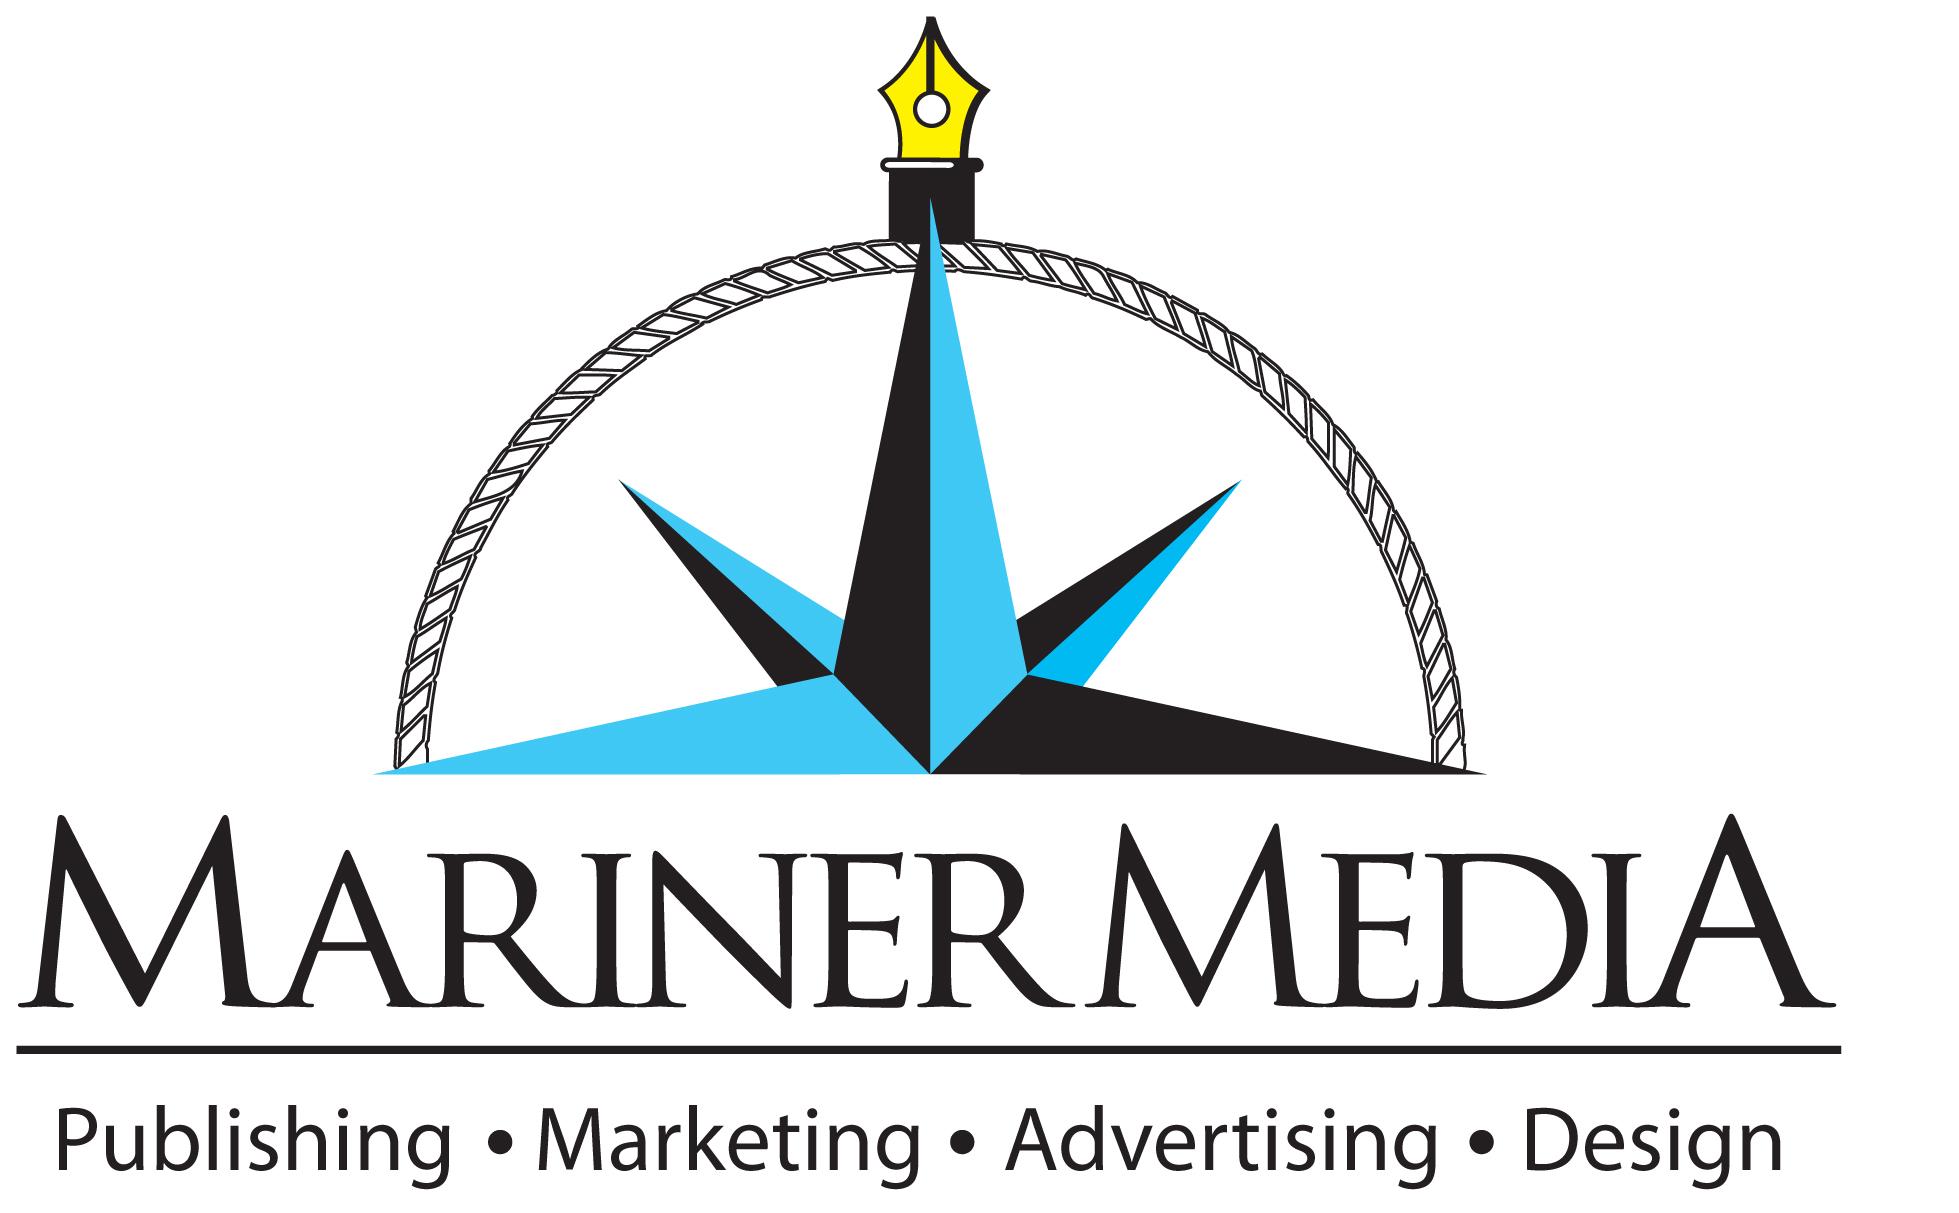 Mariner Media - Creative Advertising and Publishing Agency